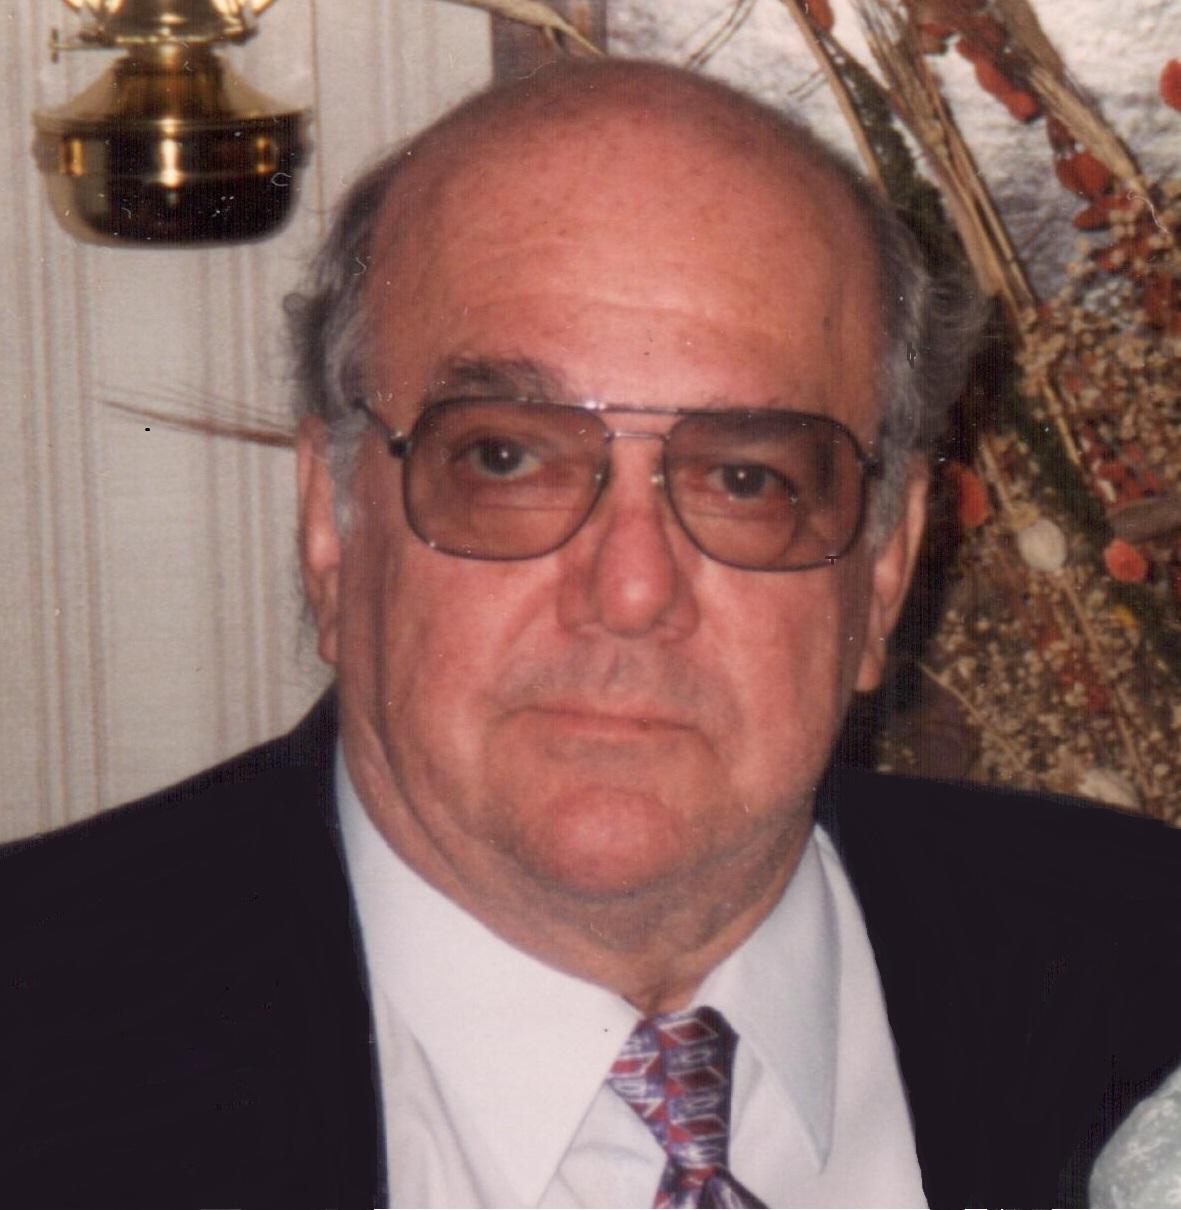 Paul E. Kreilein, age 87 of Jasper